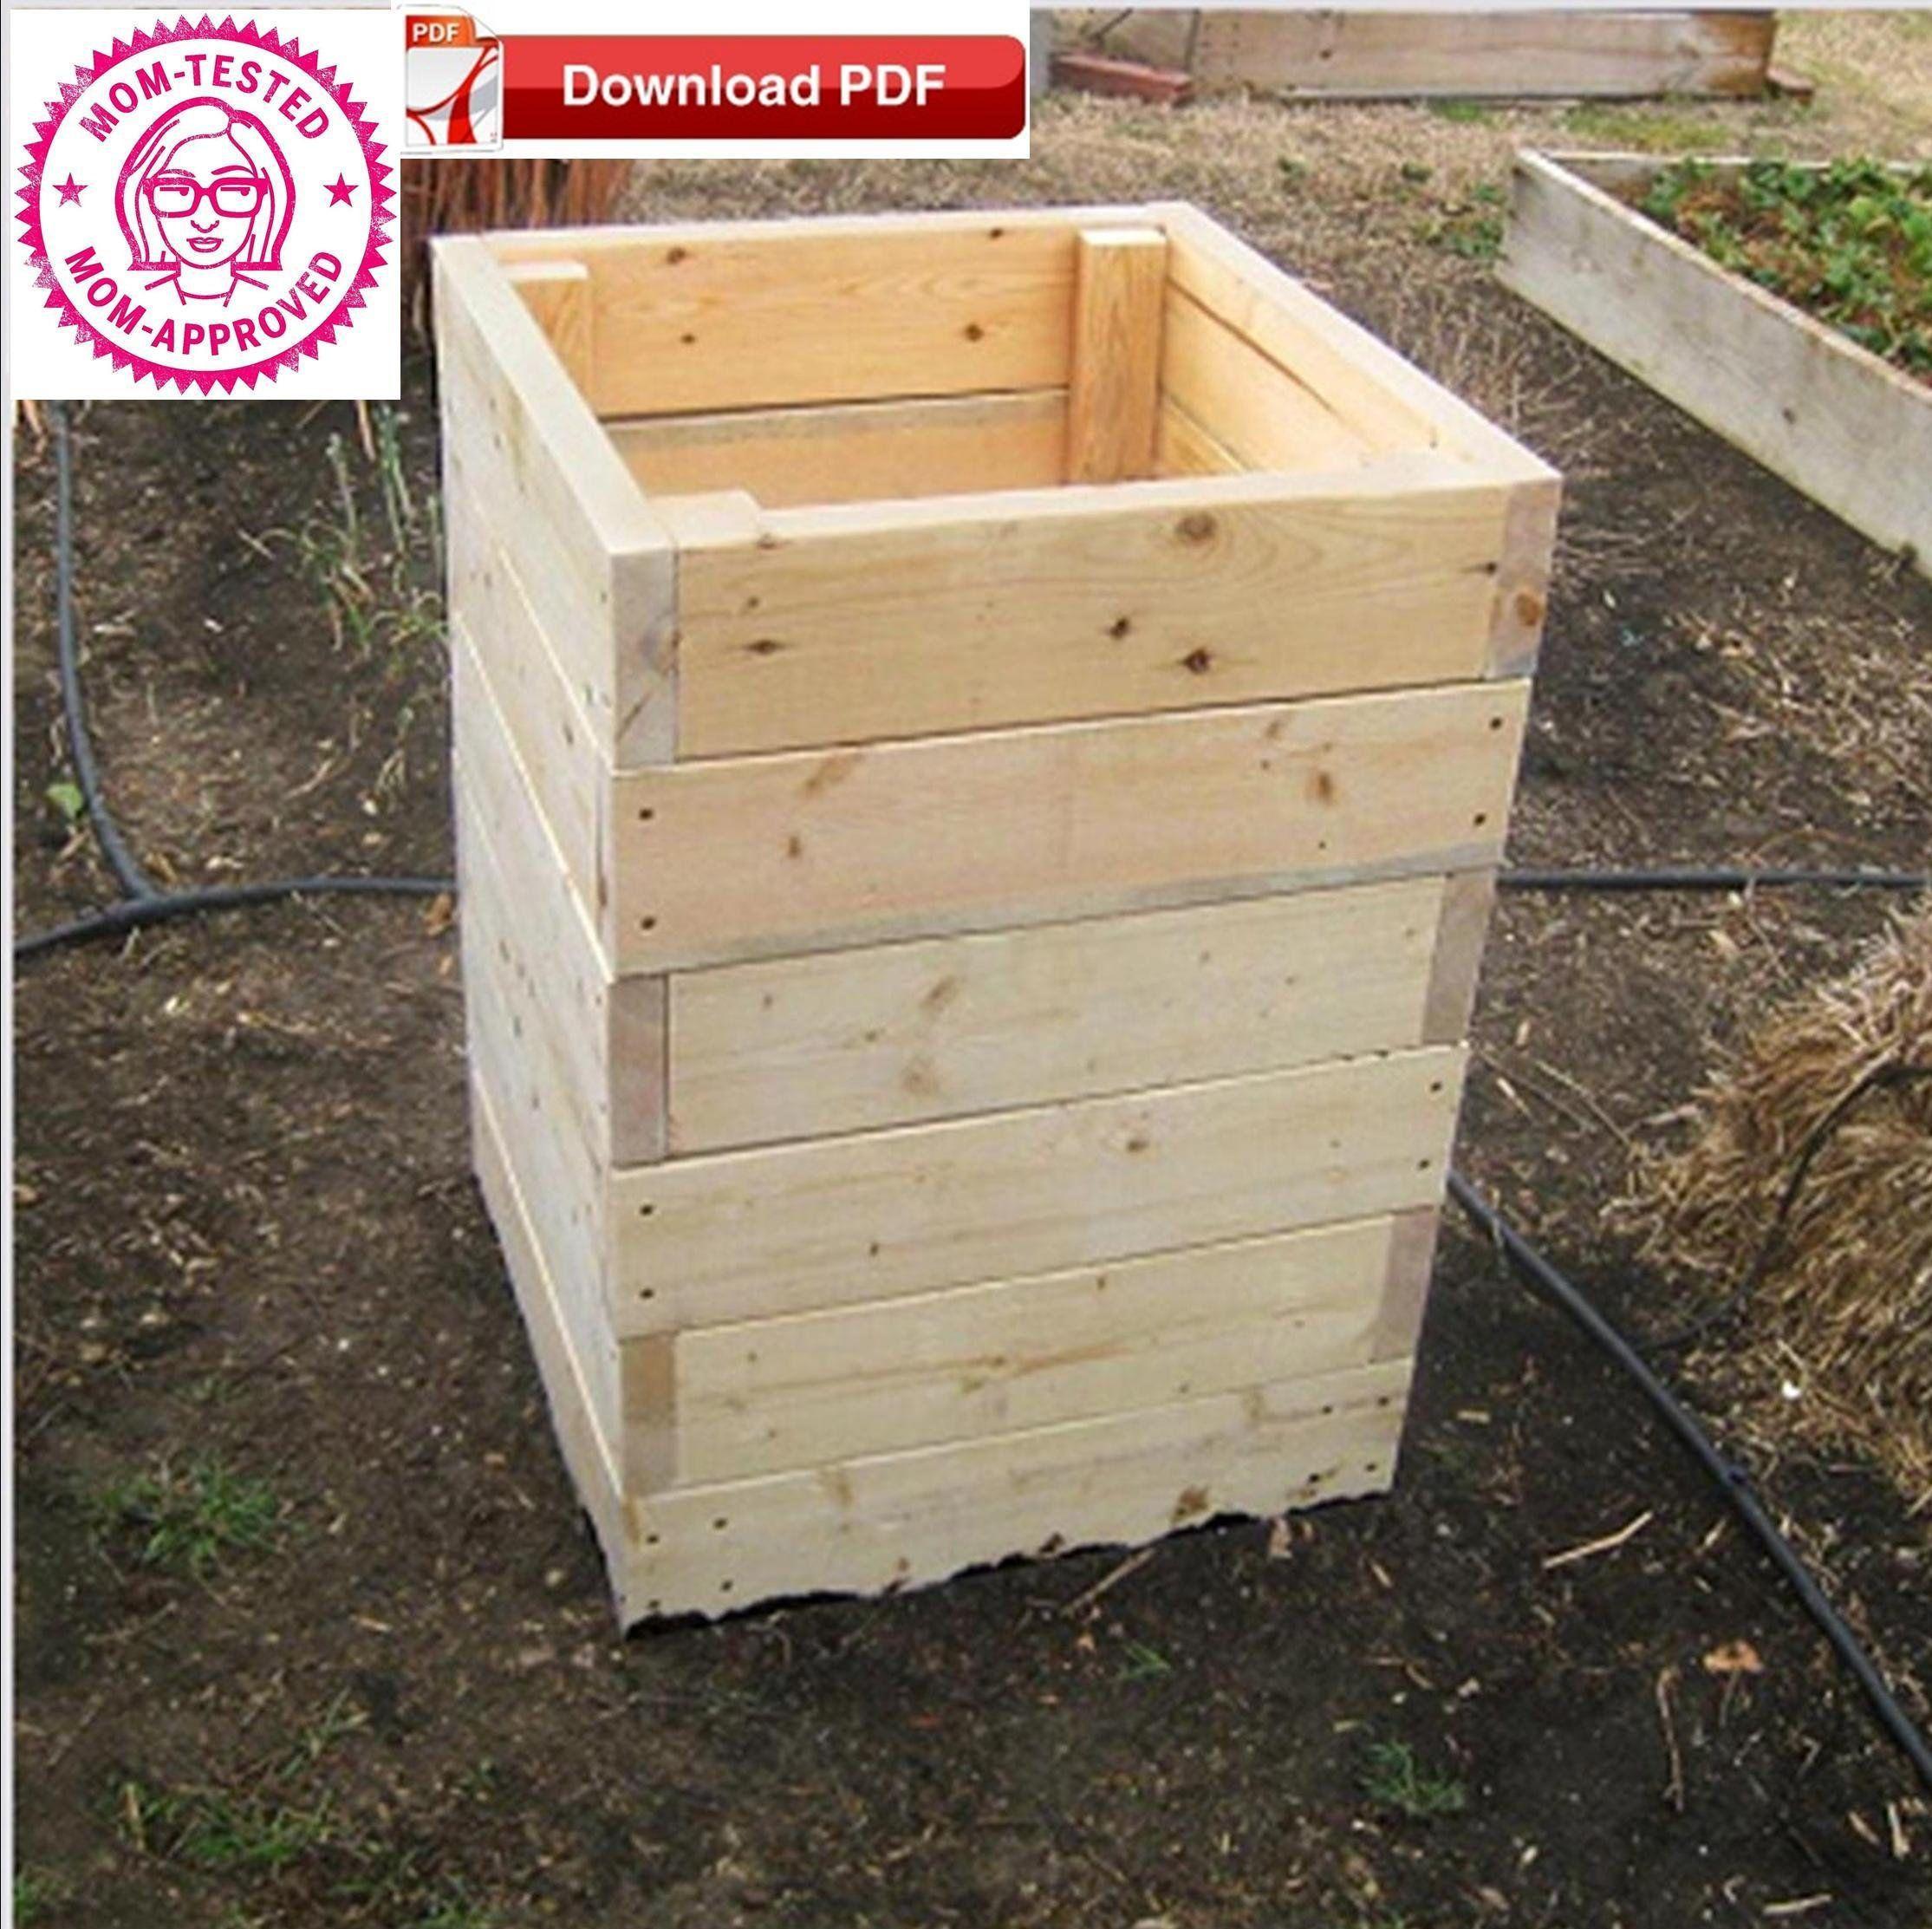 Raised Planter Box Plan Potato Planter Box Plan Organic Raised Etsy Potato Planters Planter Box Plans Garden Box Plans